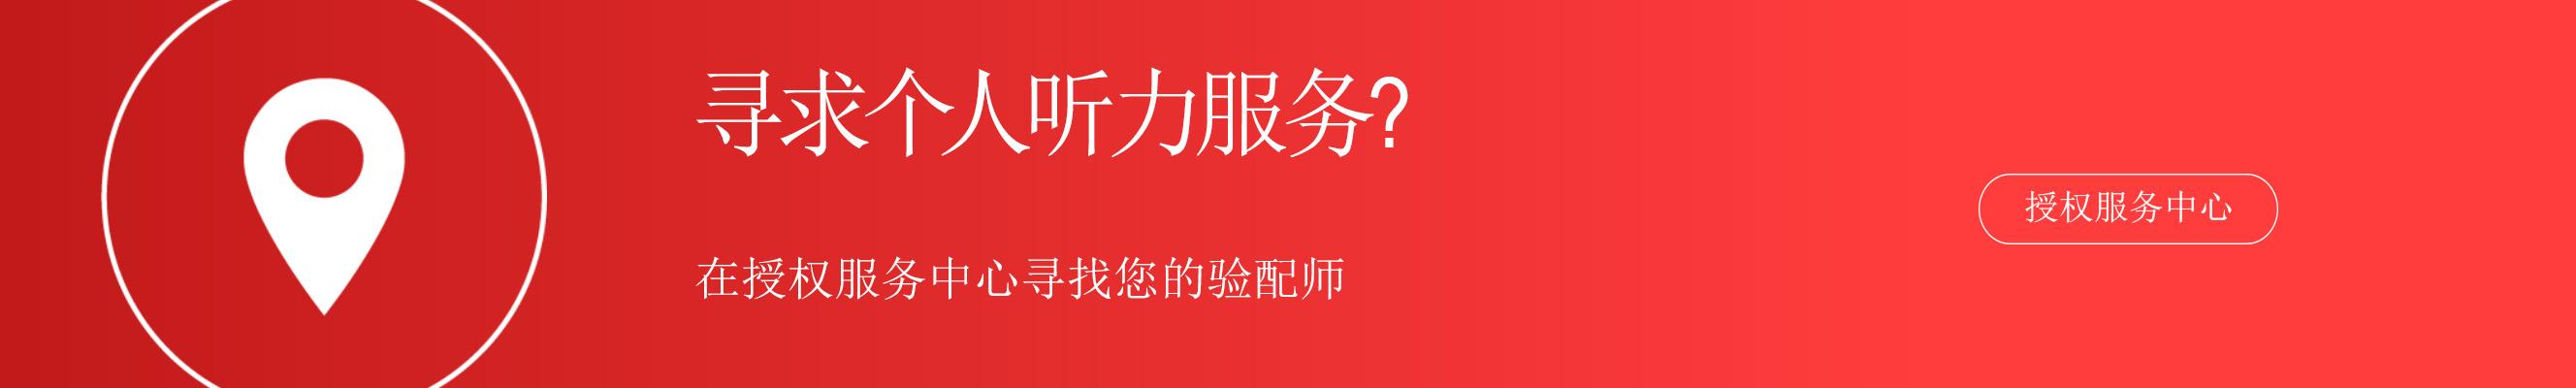 CN_StoreLocator_teaser_2656x400